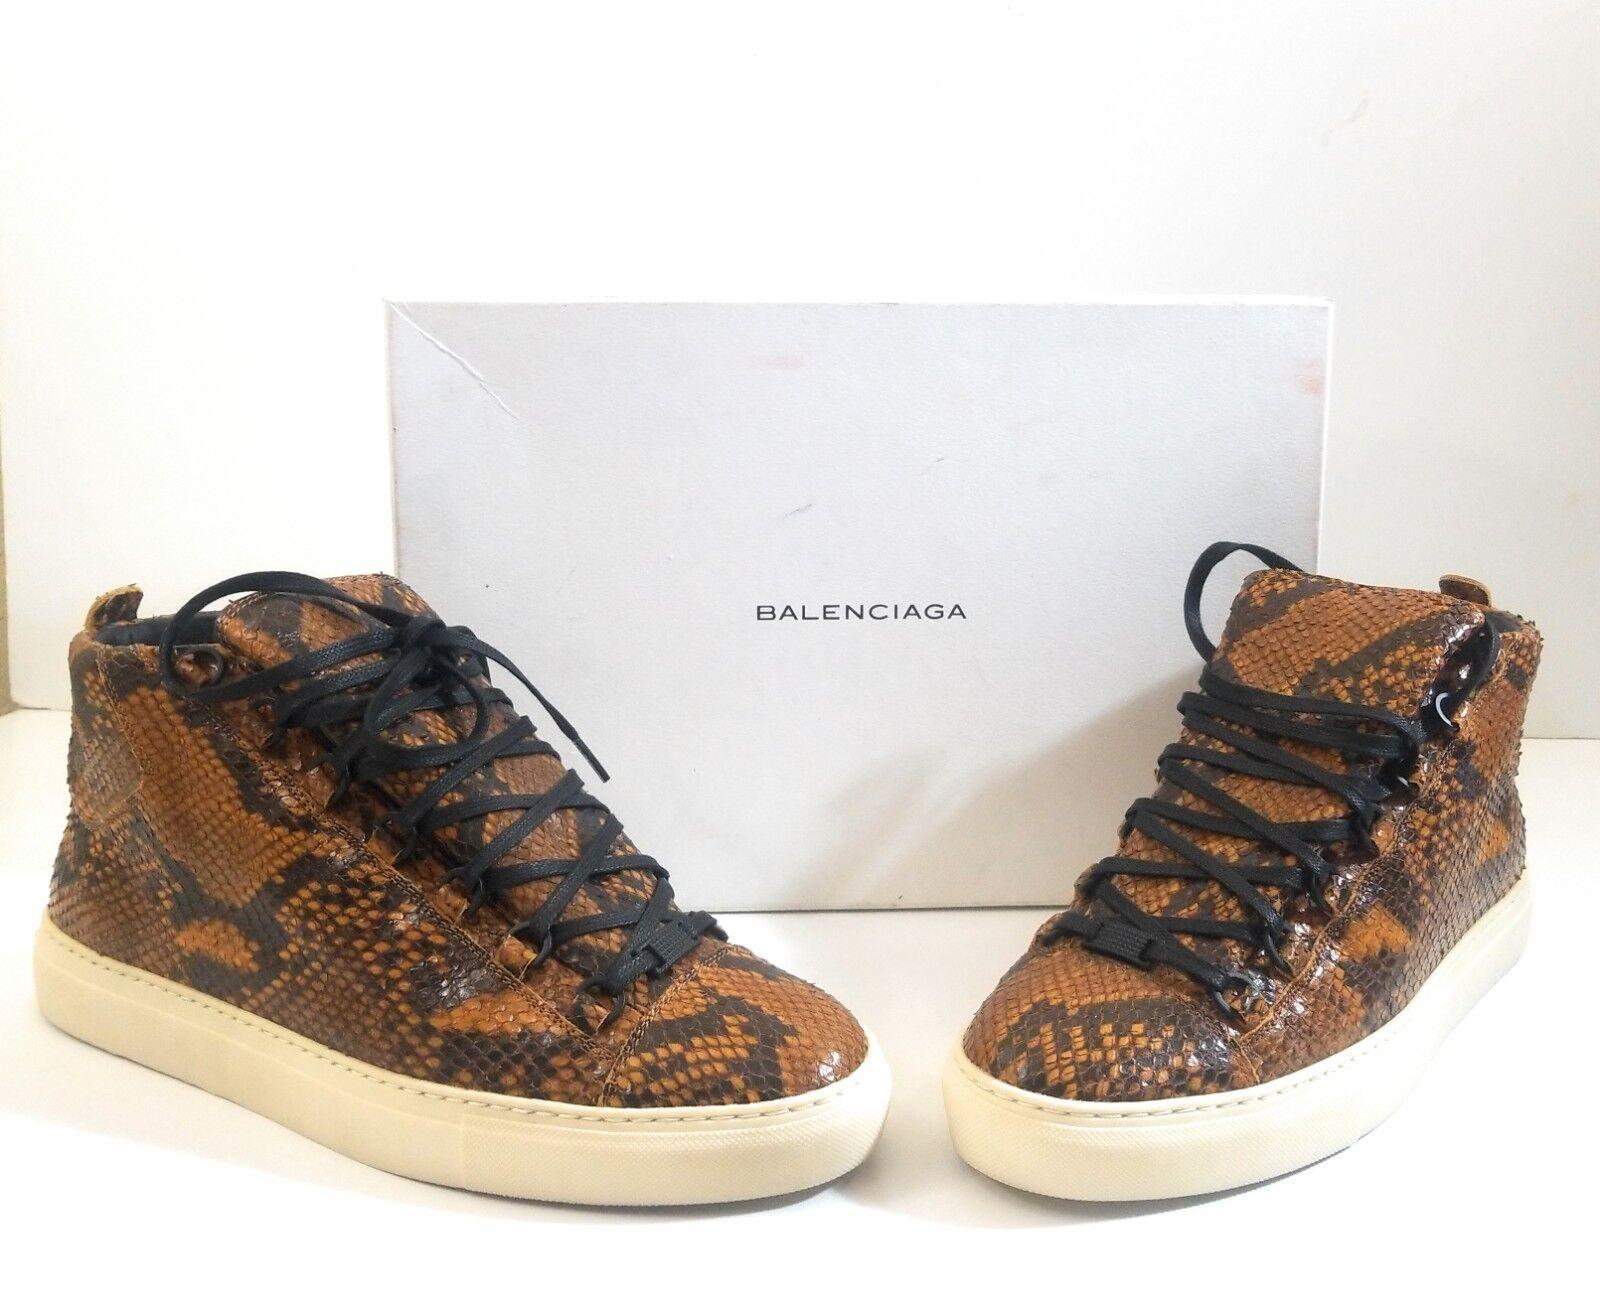 Balenciaga Pelle S.Gomm Veau Facon Python Men High Top Fashion Sneakers Size 44